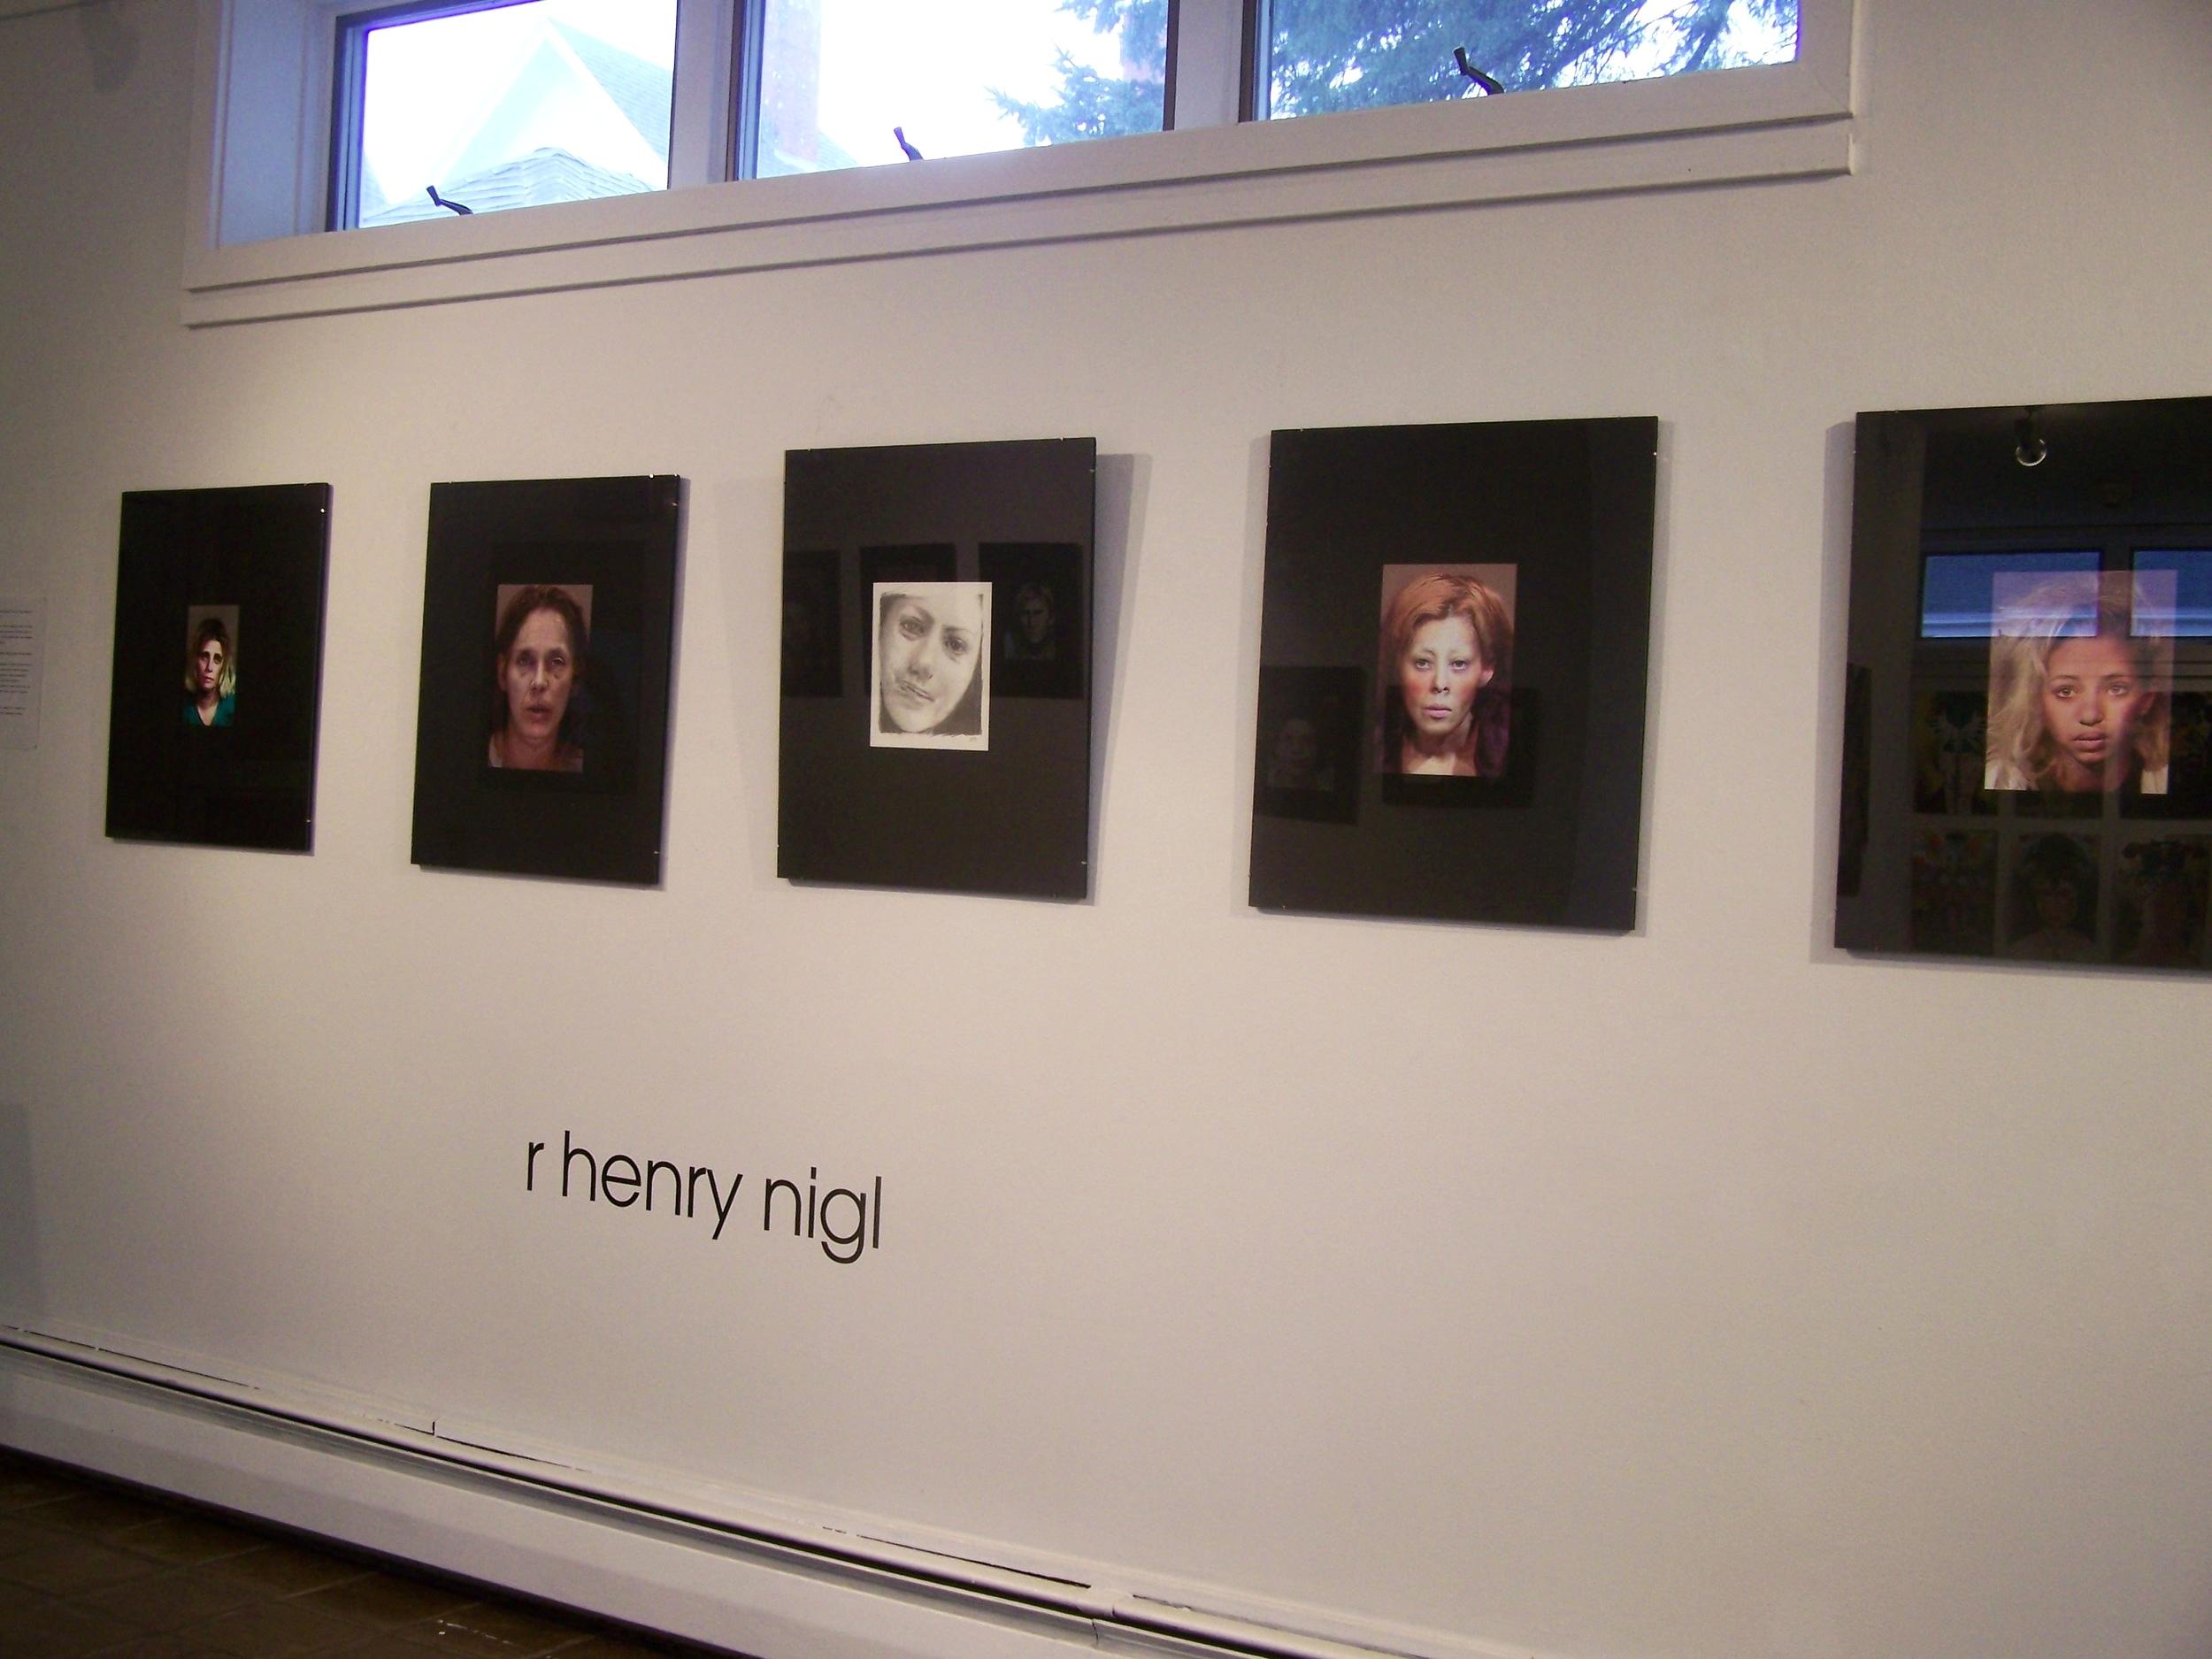 R. Henry Nigl